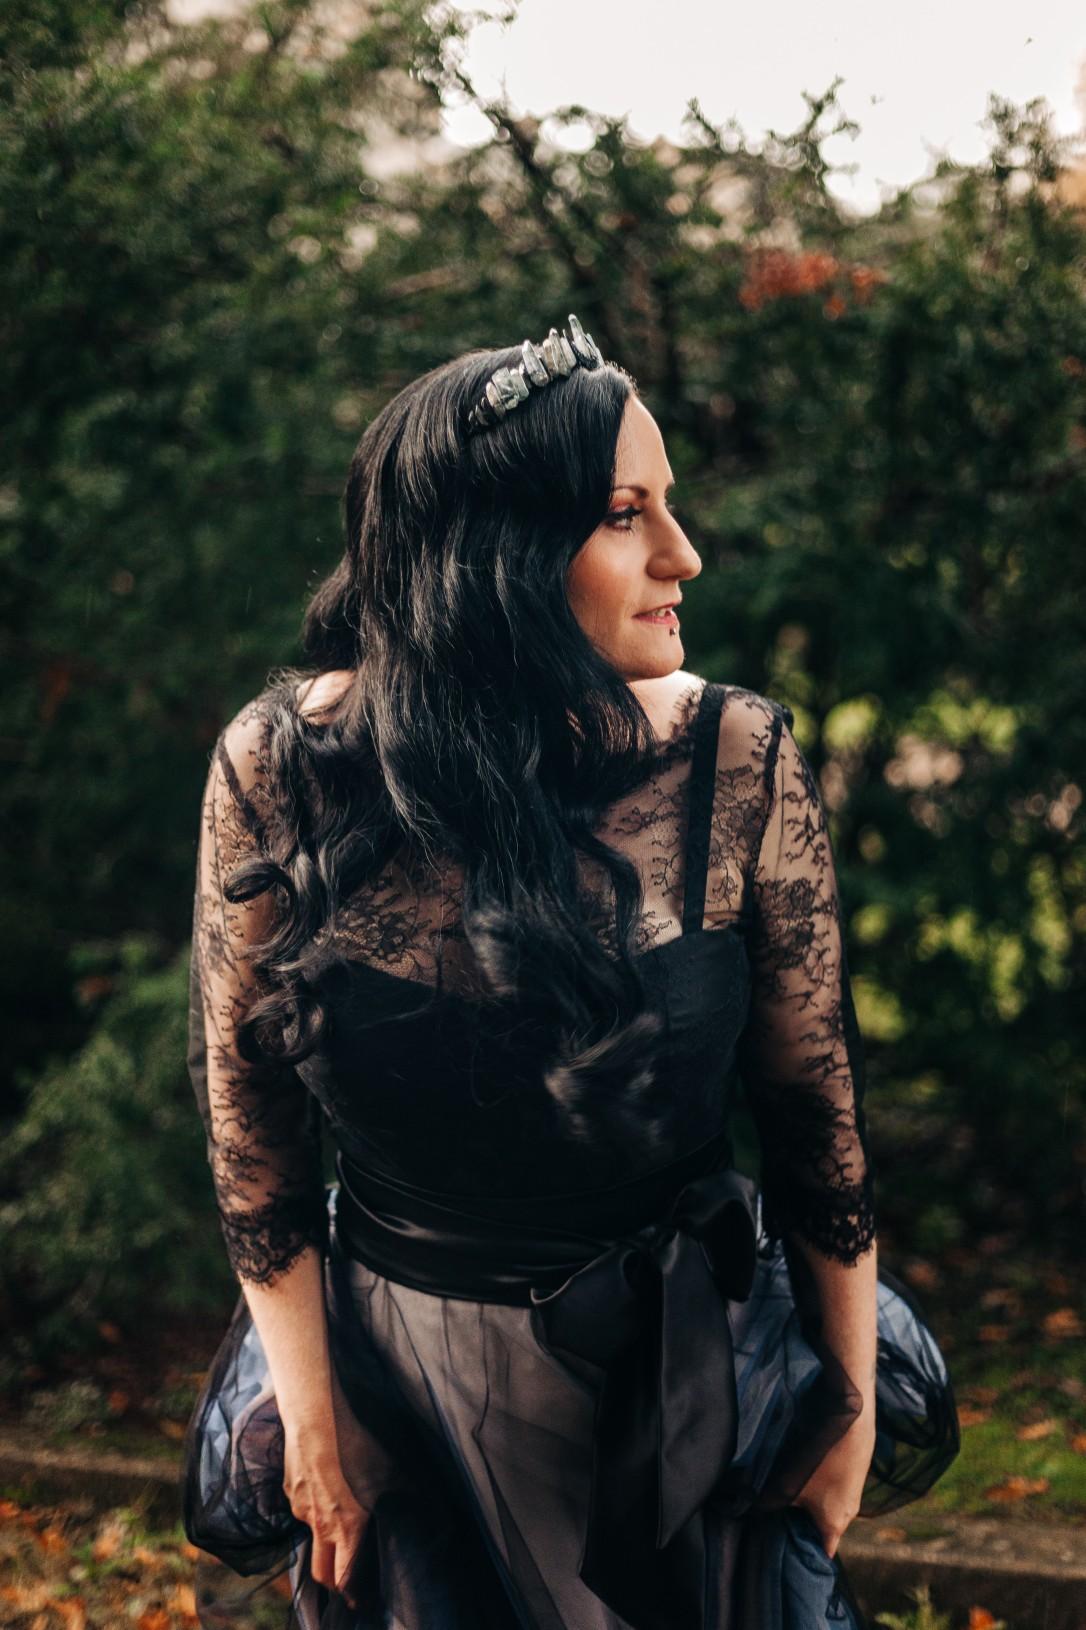 alternative wedding dress - gothic bridal look - black wedding dress - gothic wedding